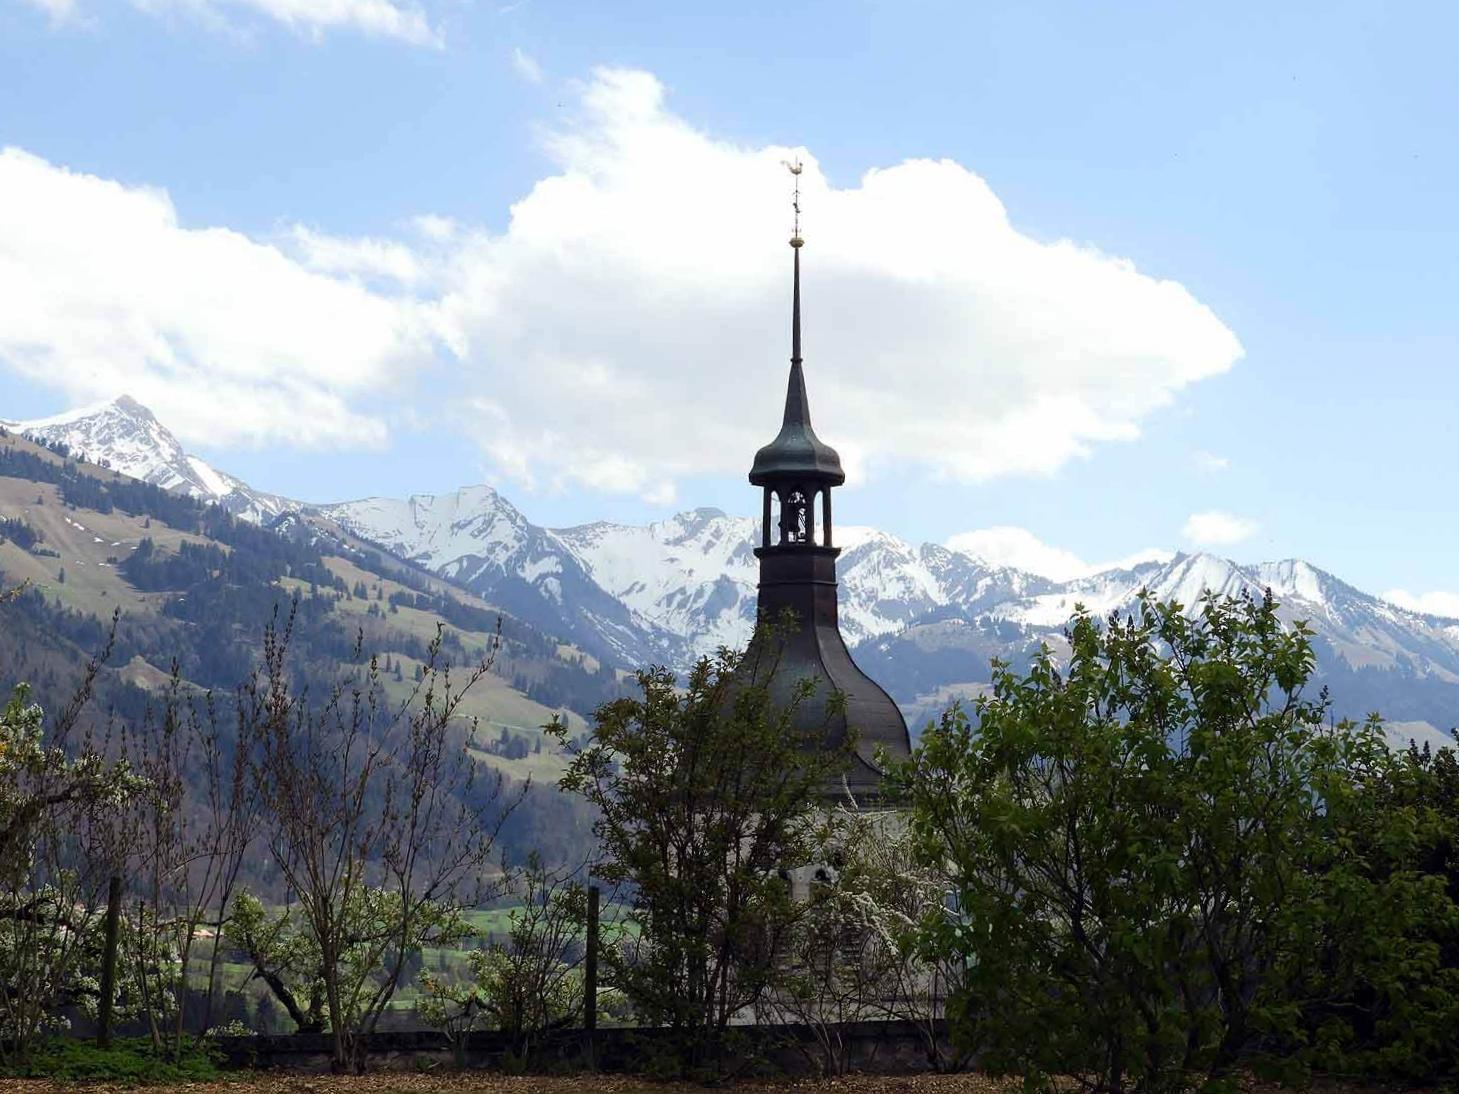 switzerland-gruyeres-steeple-roof-mountains.JPG